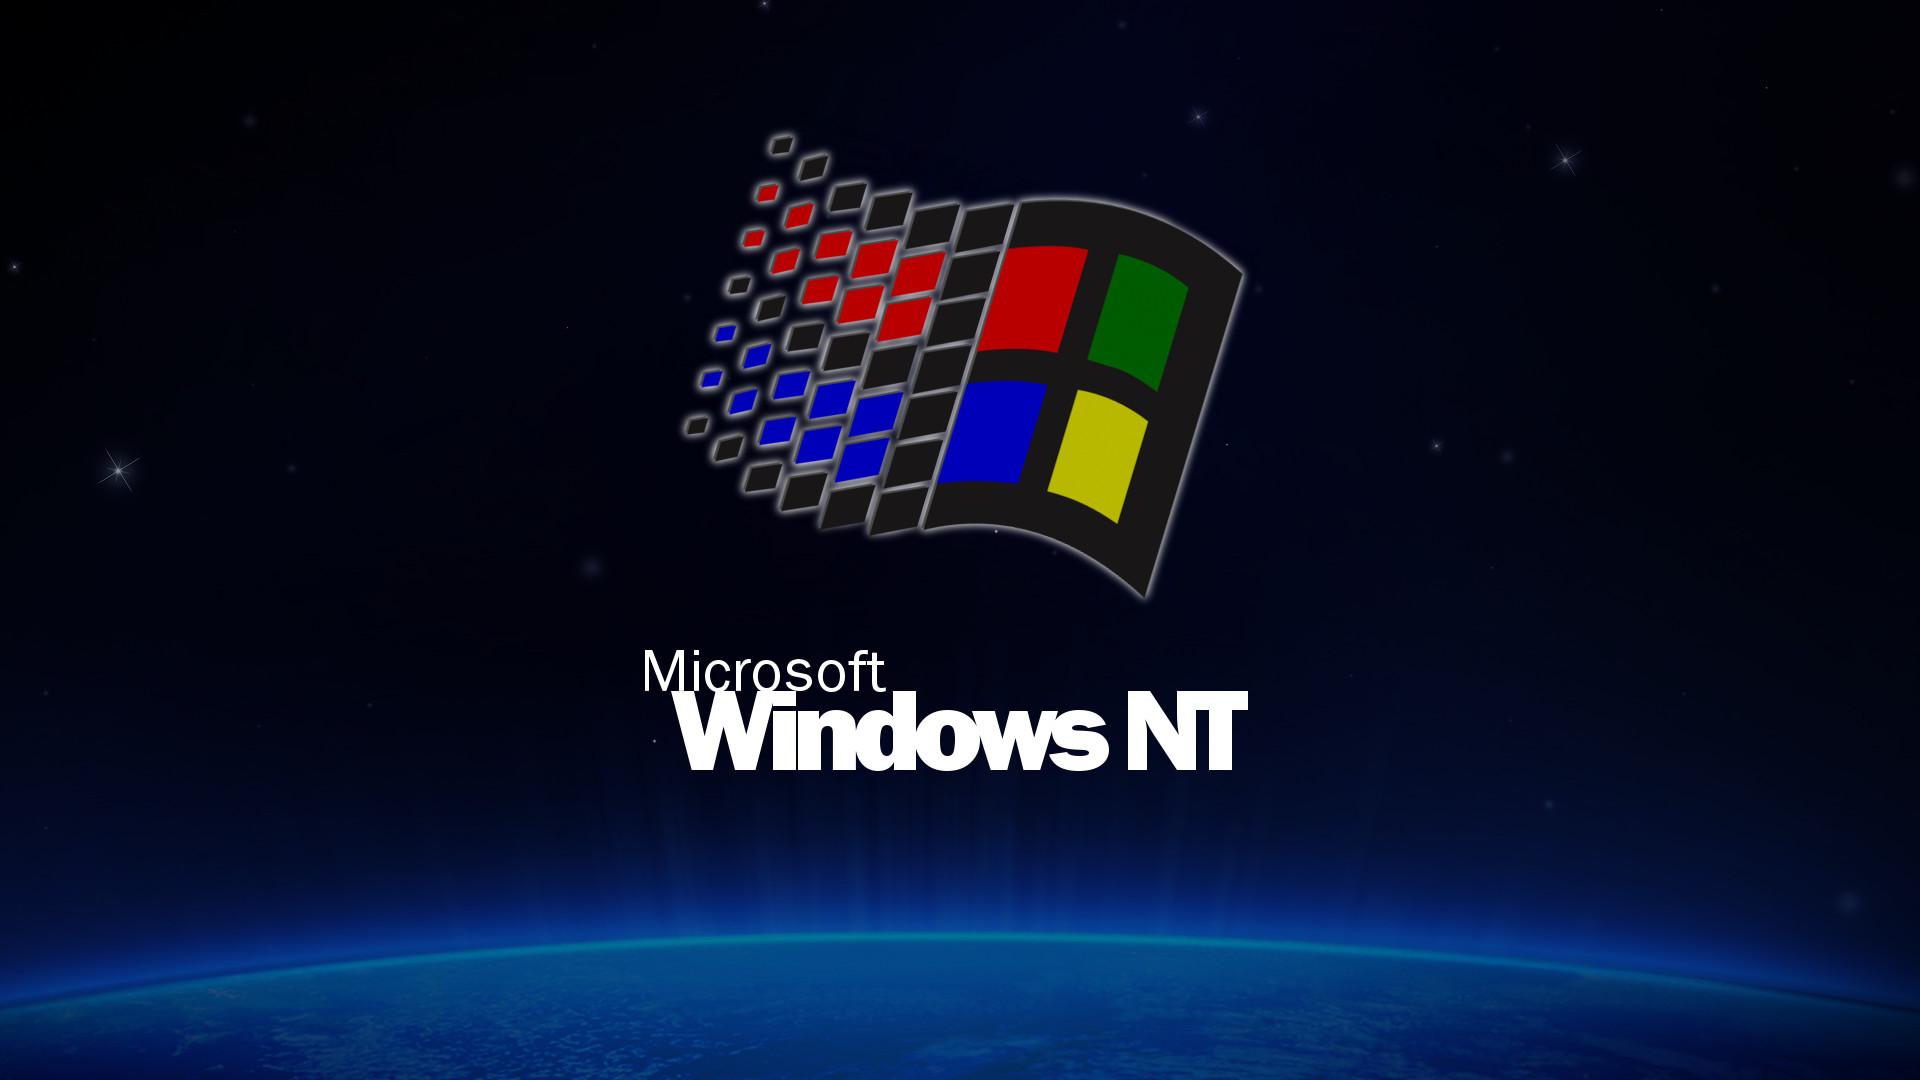 Windows NT 4.0 Wallpaper